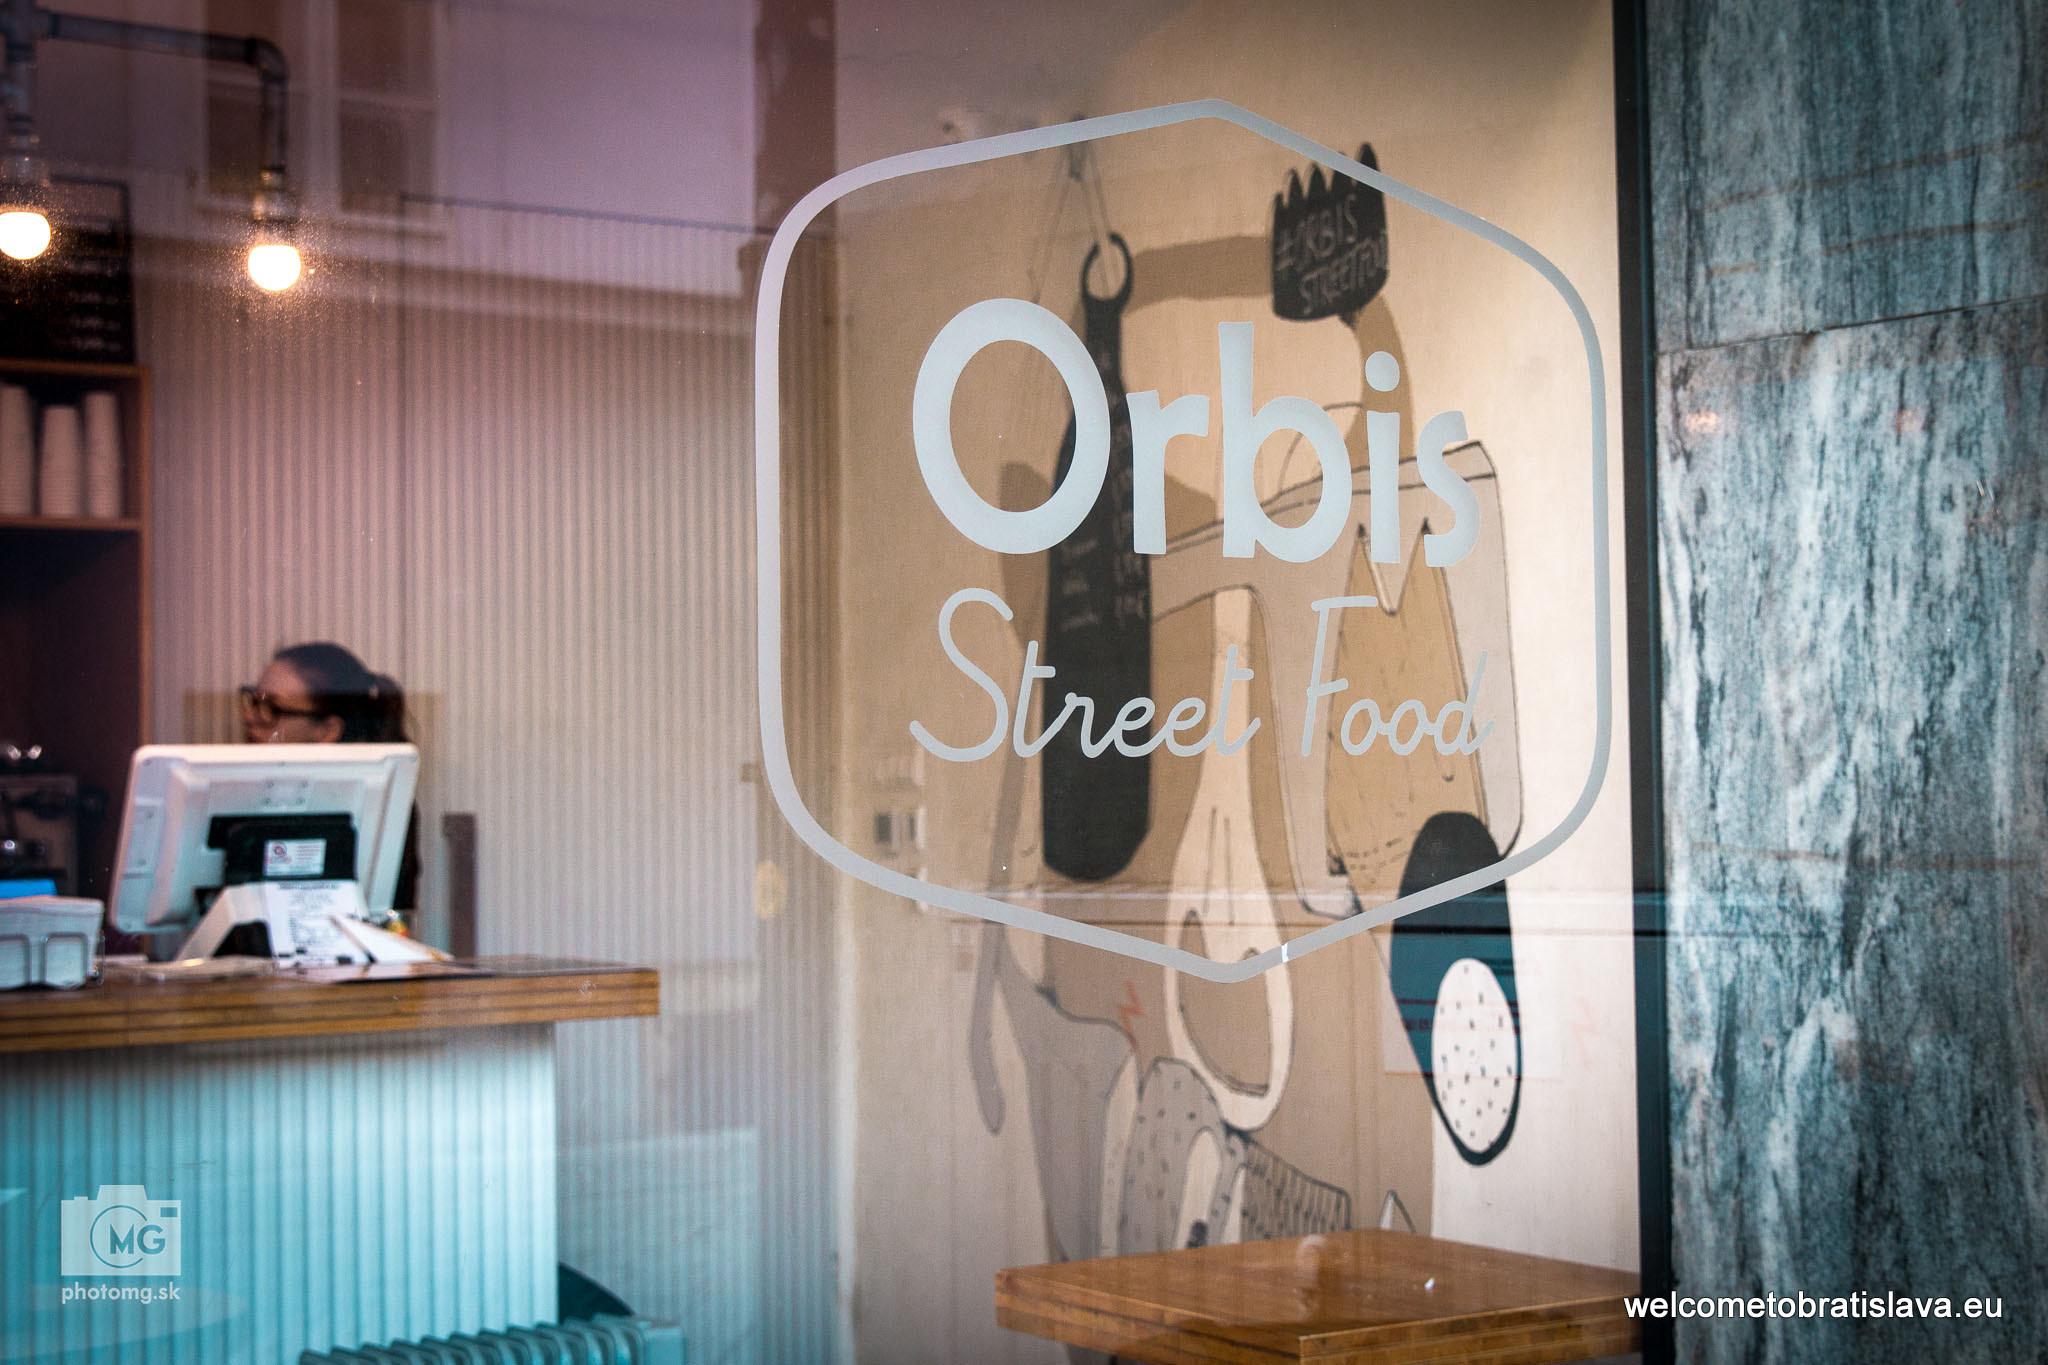 Orbis Street Food